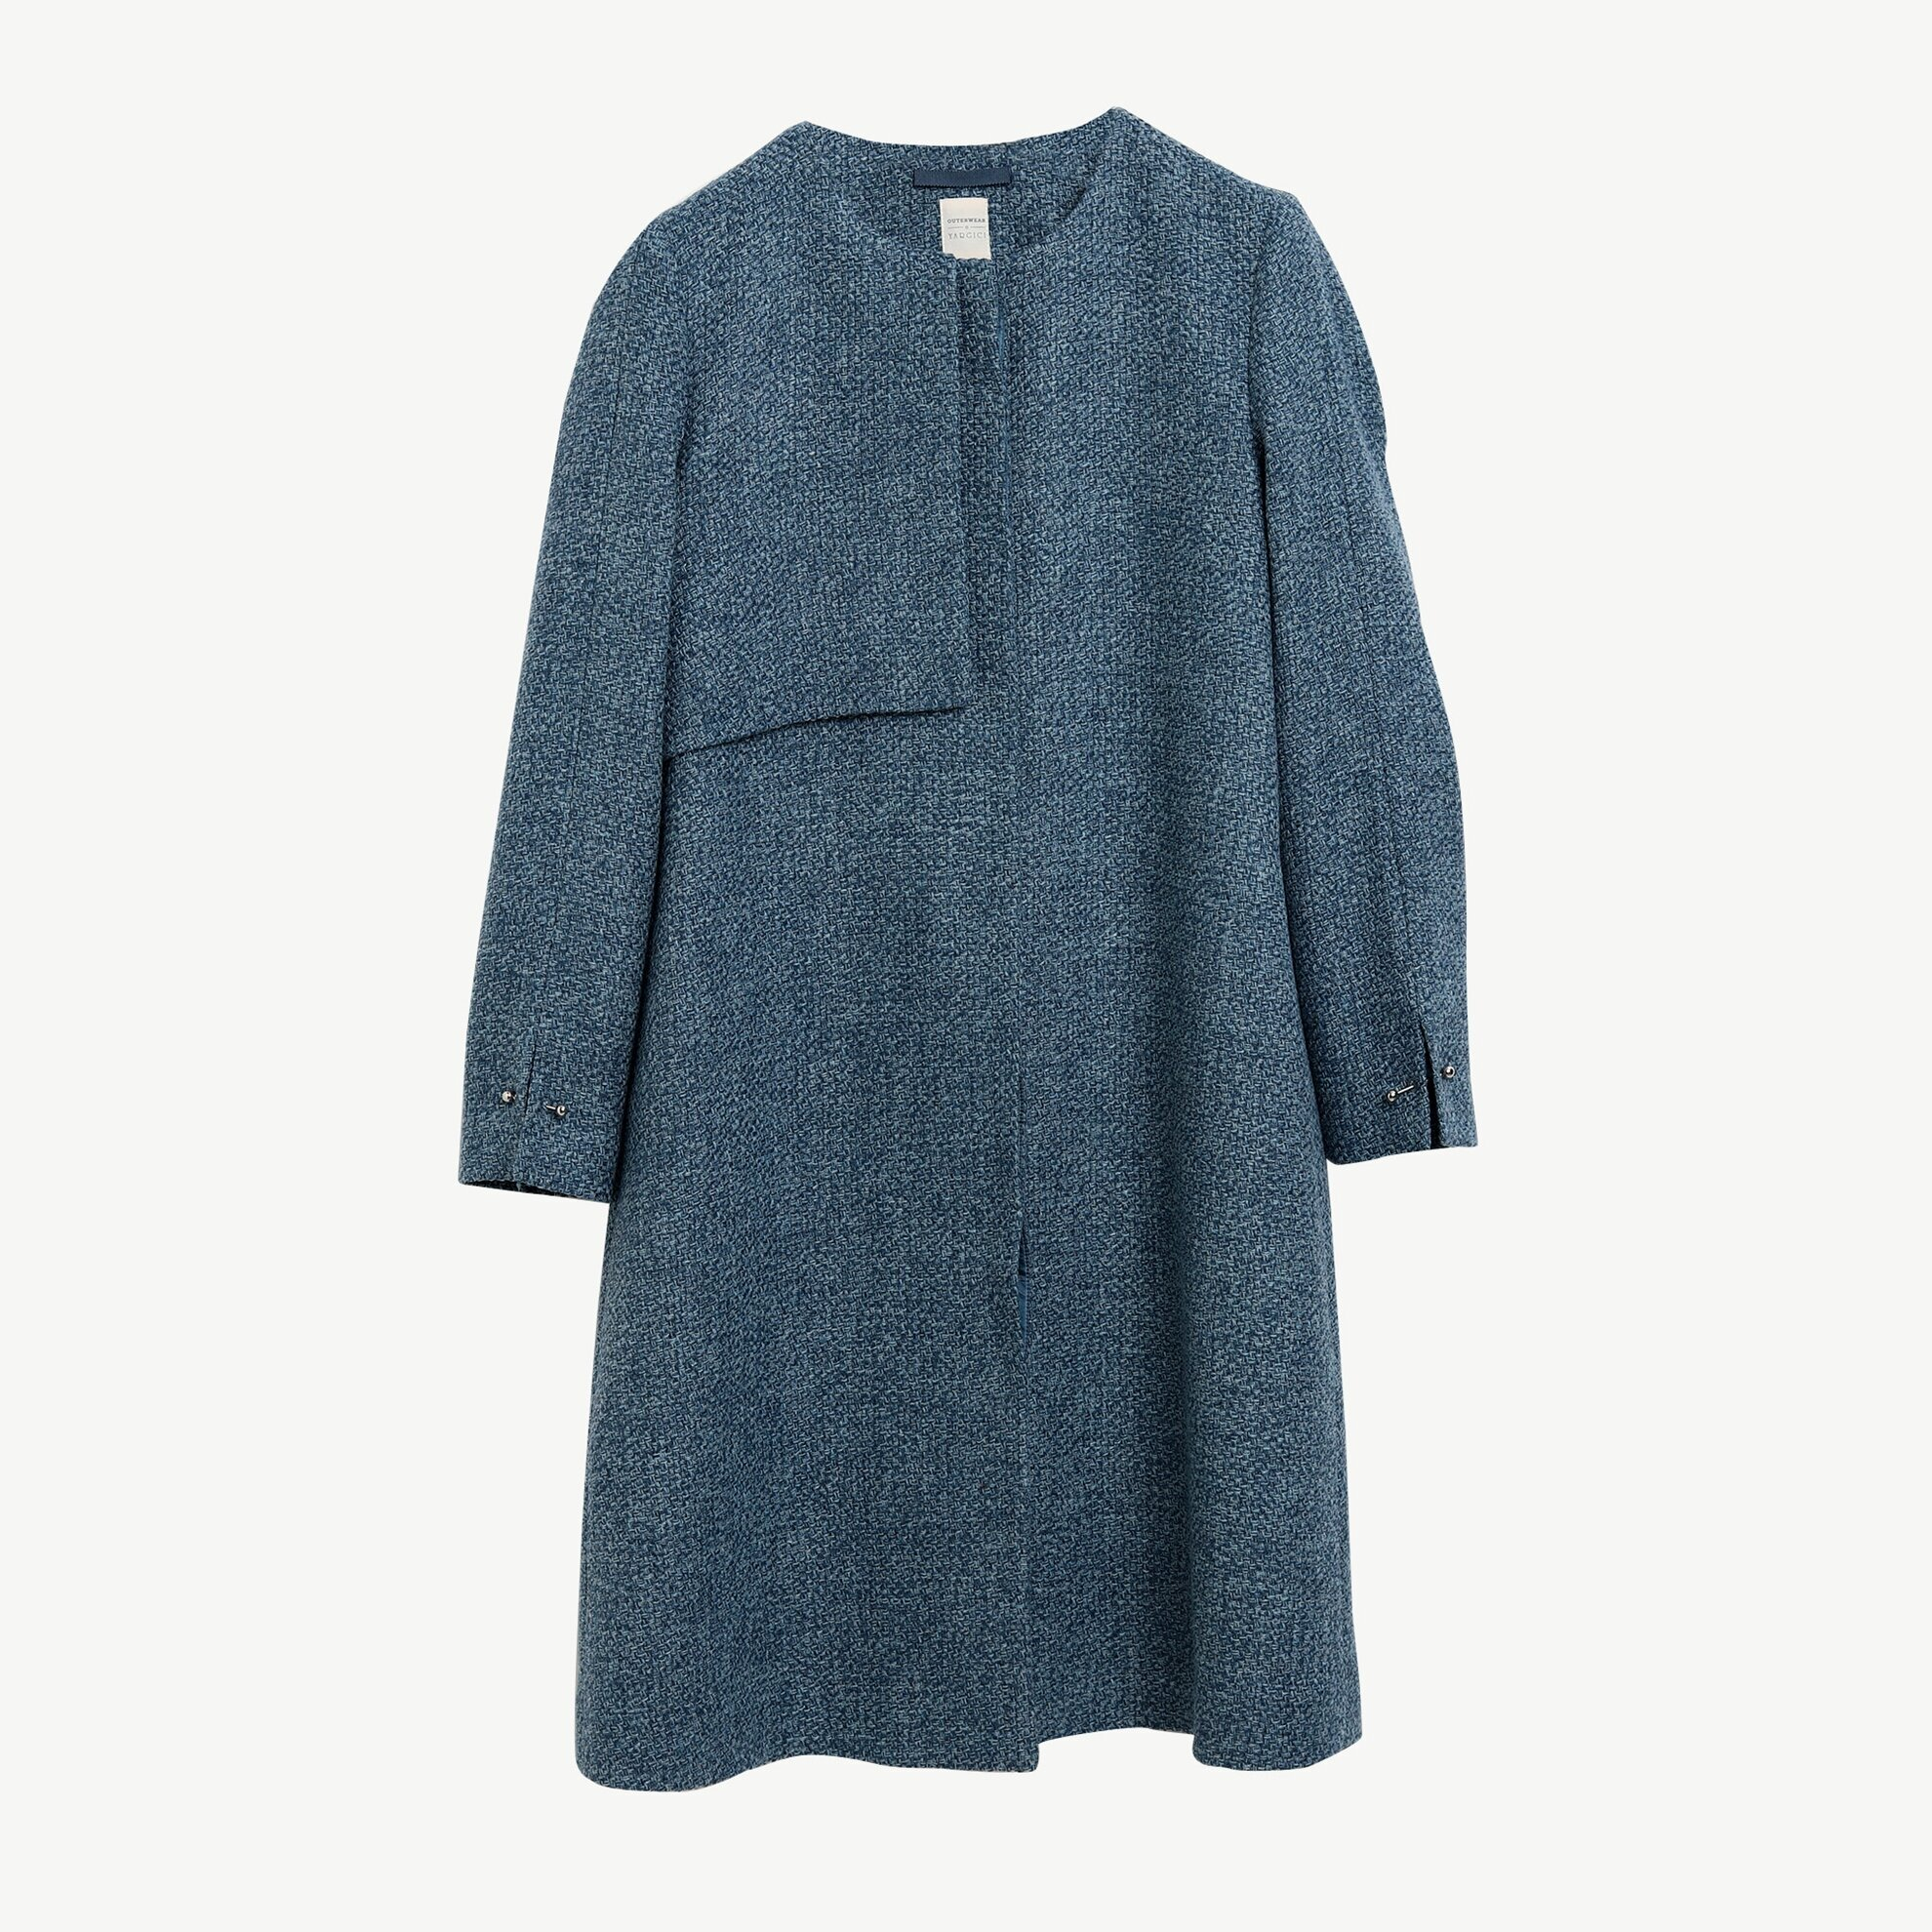 Langer Mantel ohne Kragen